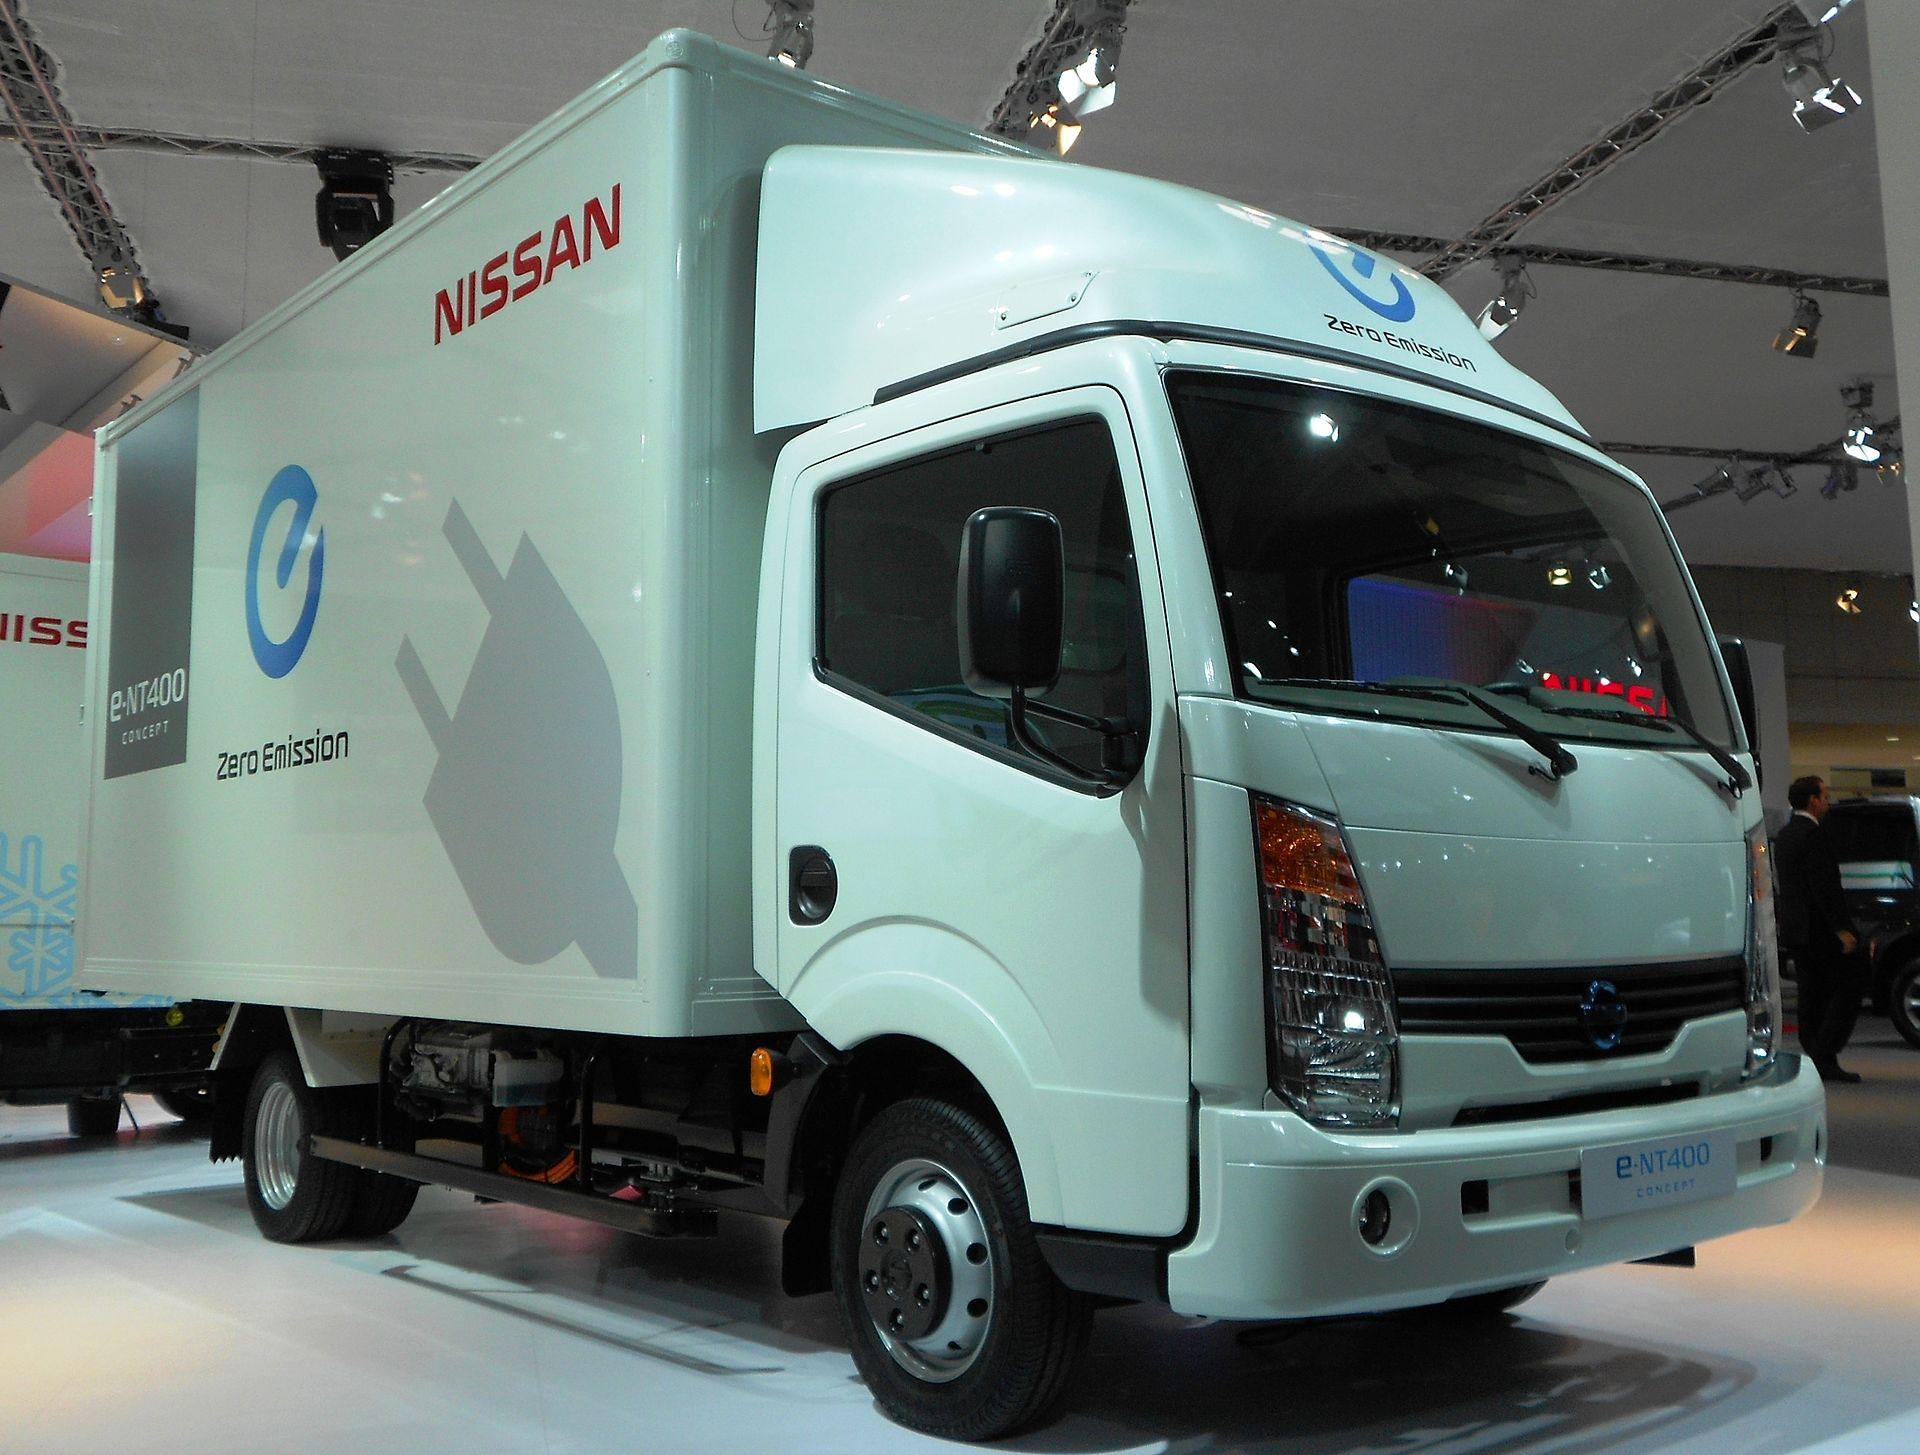 Electric truck - Wikipedia